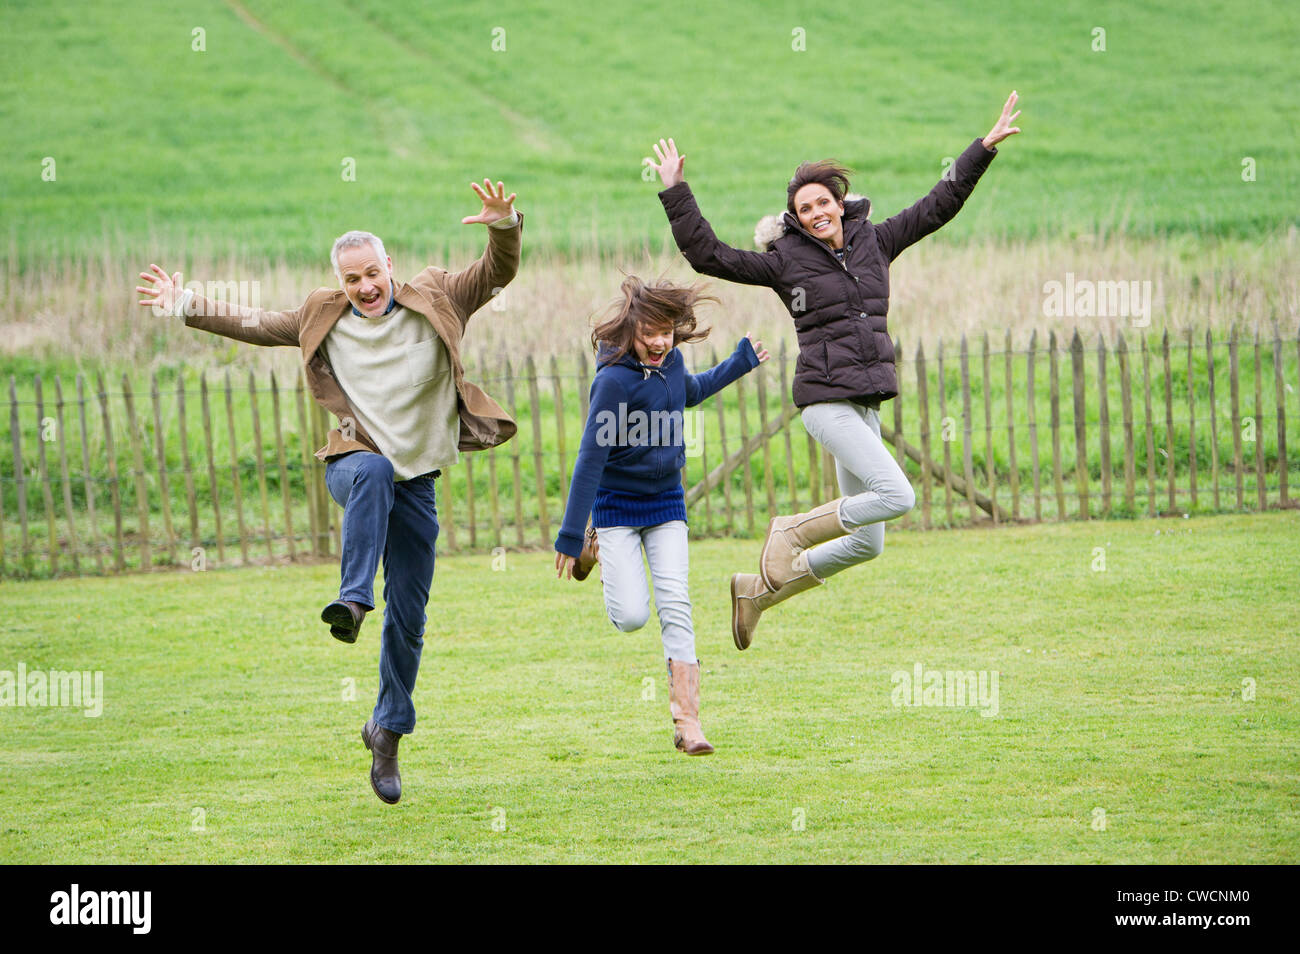 Happy family having fun in a field - Stock Image